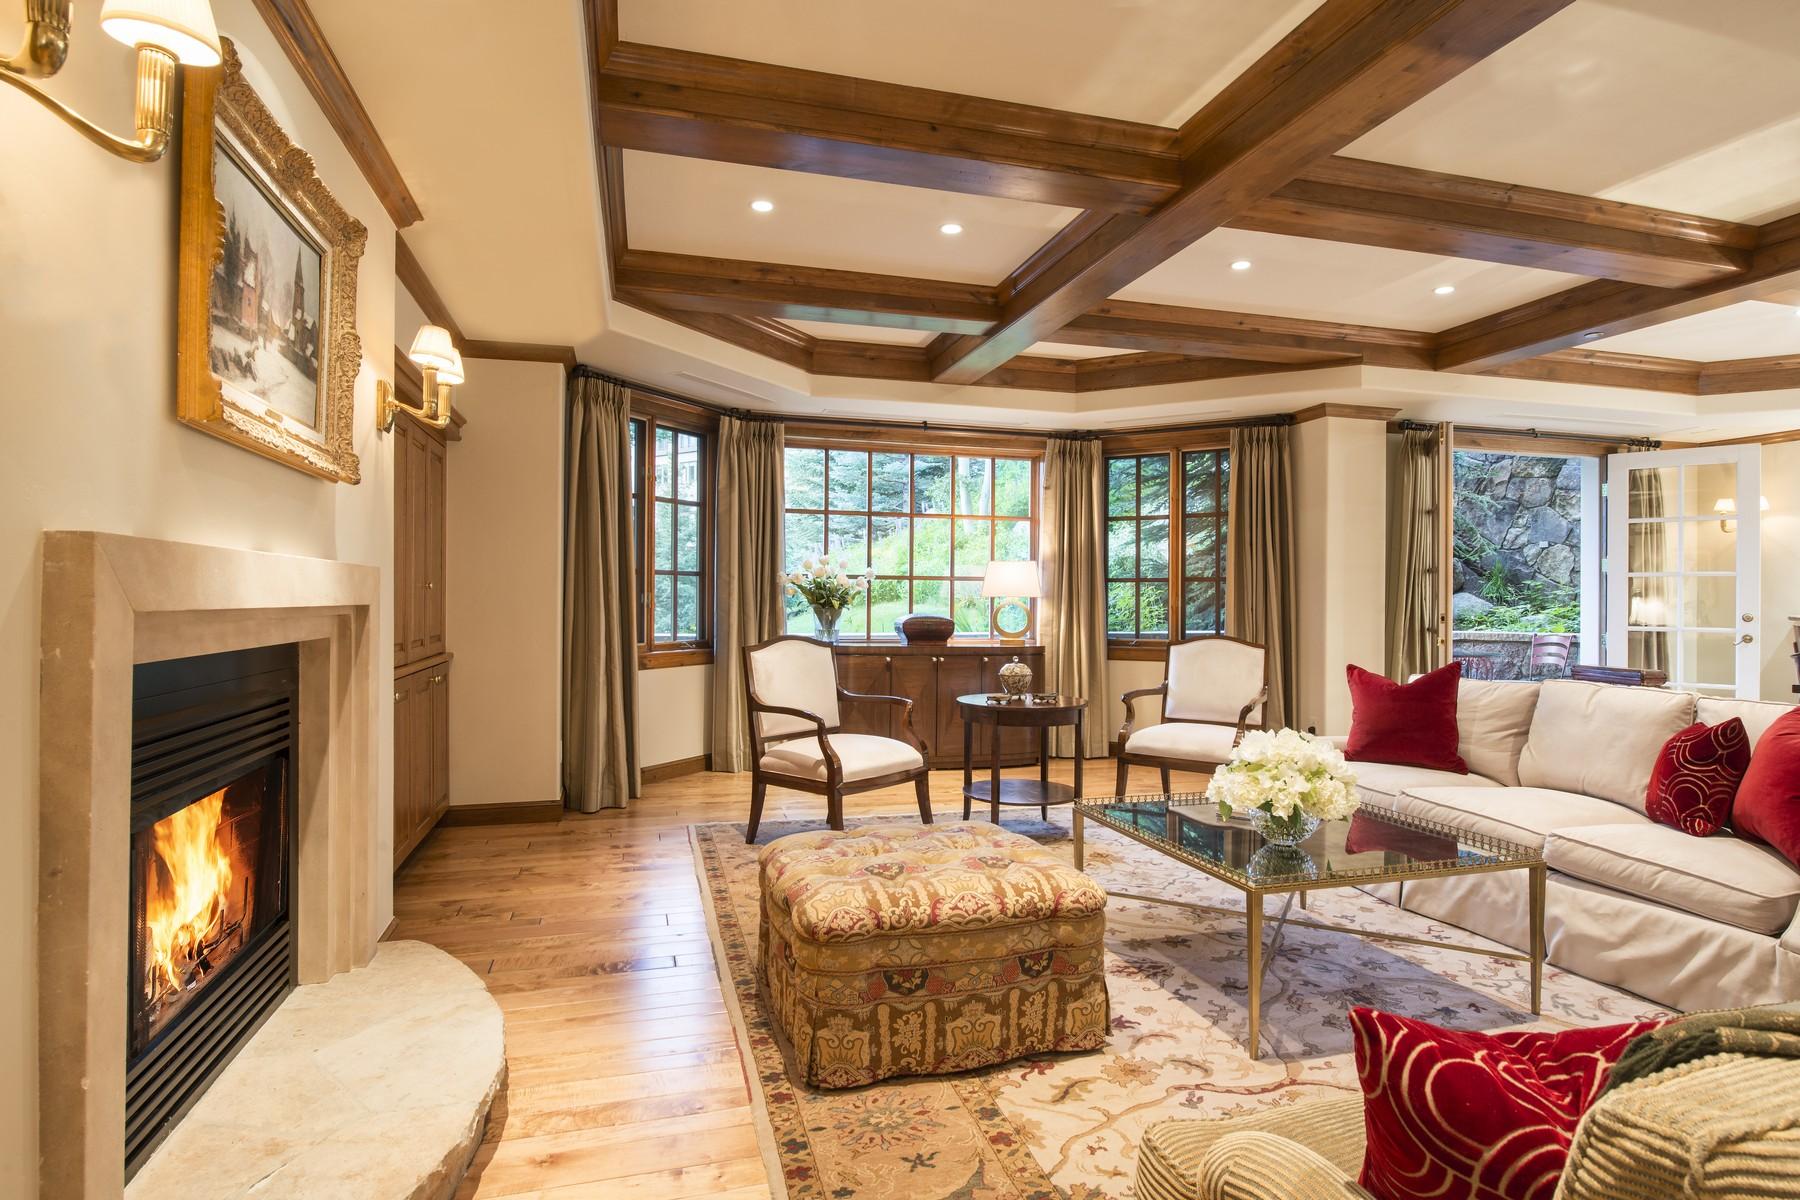 Condominium for Sale at The Chateau Terrace #1090 122 Scott Hill Road Beaver Creek, Beaver Creek, Colorado 81620 United States